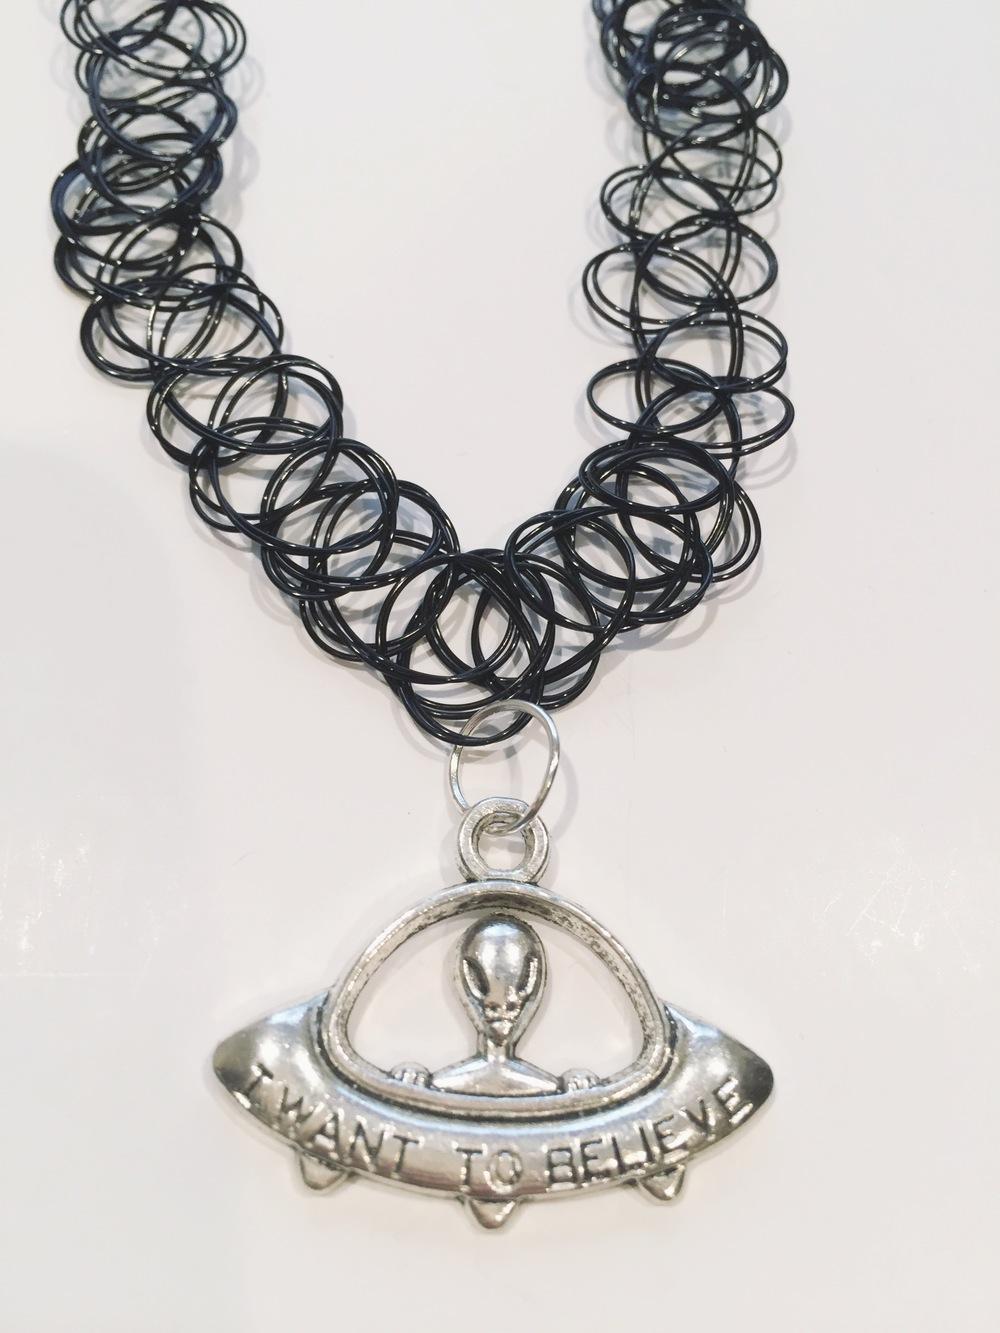 Raina i want to believe alien tattoo choker necklace